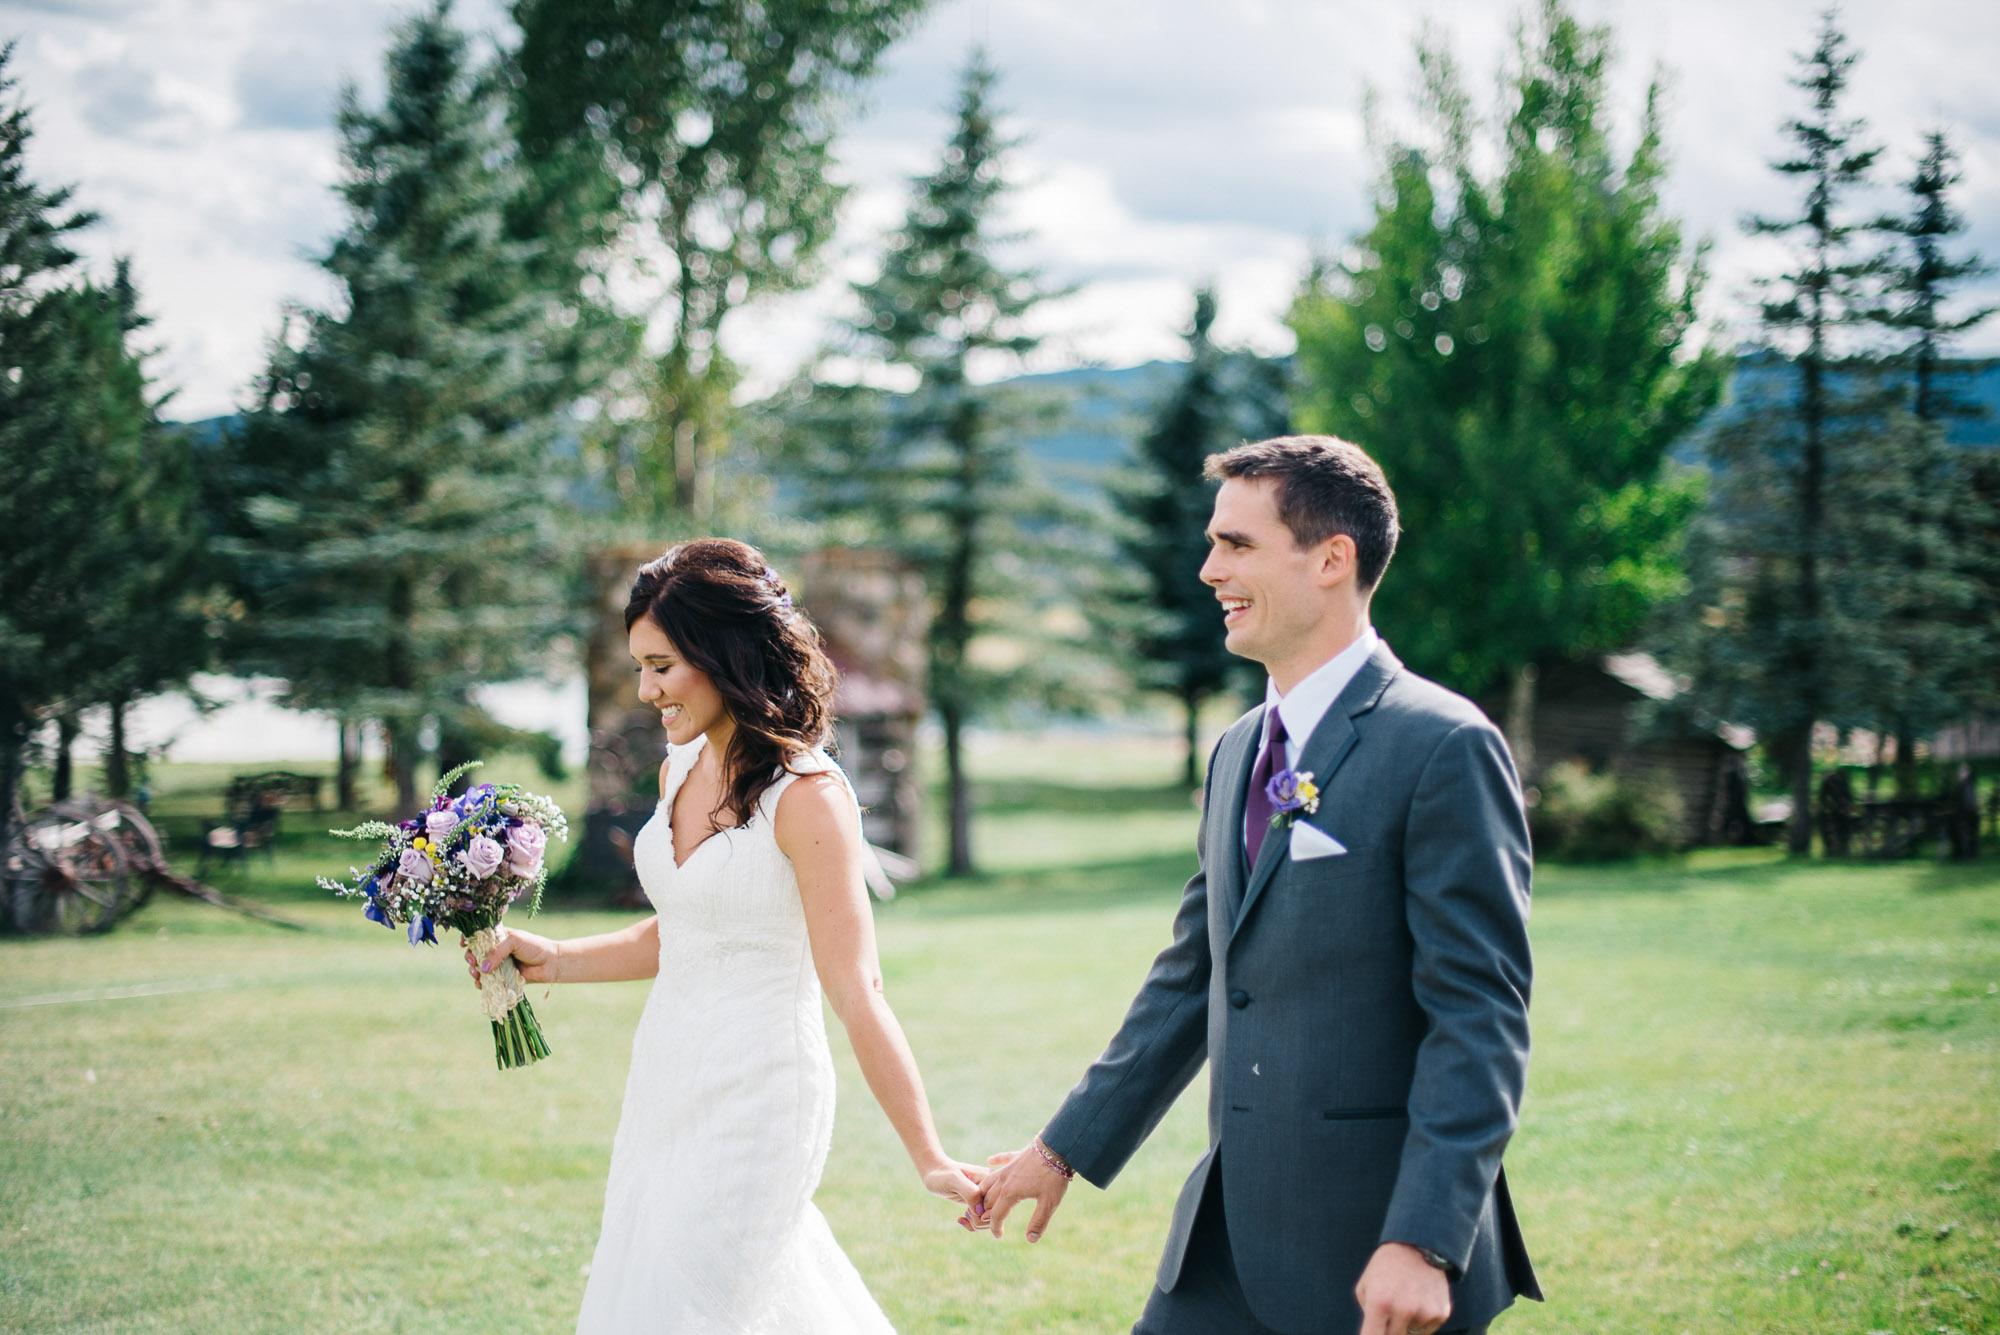 120elopement-photographer-colorado-evergreen_barn_wedding_photos_mountain_wedding_photographer_courtney&kirby_2123-2.jpg